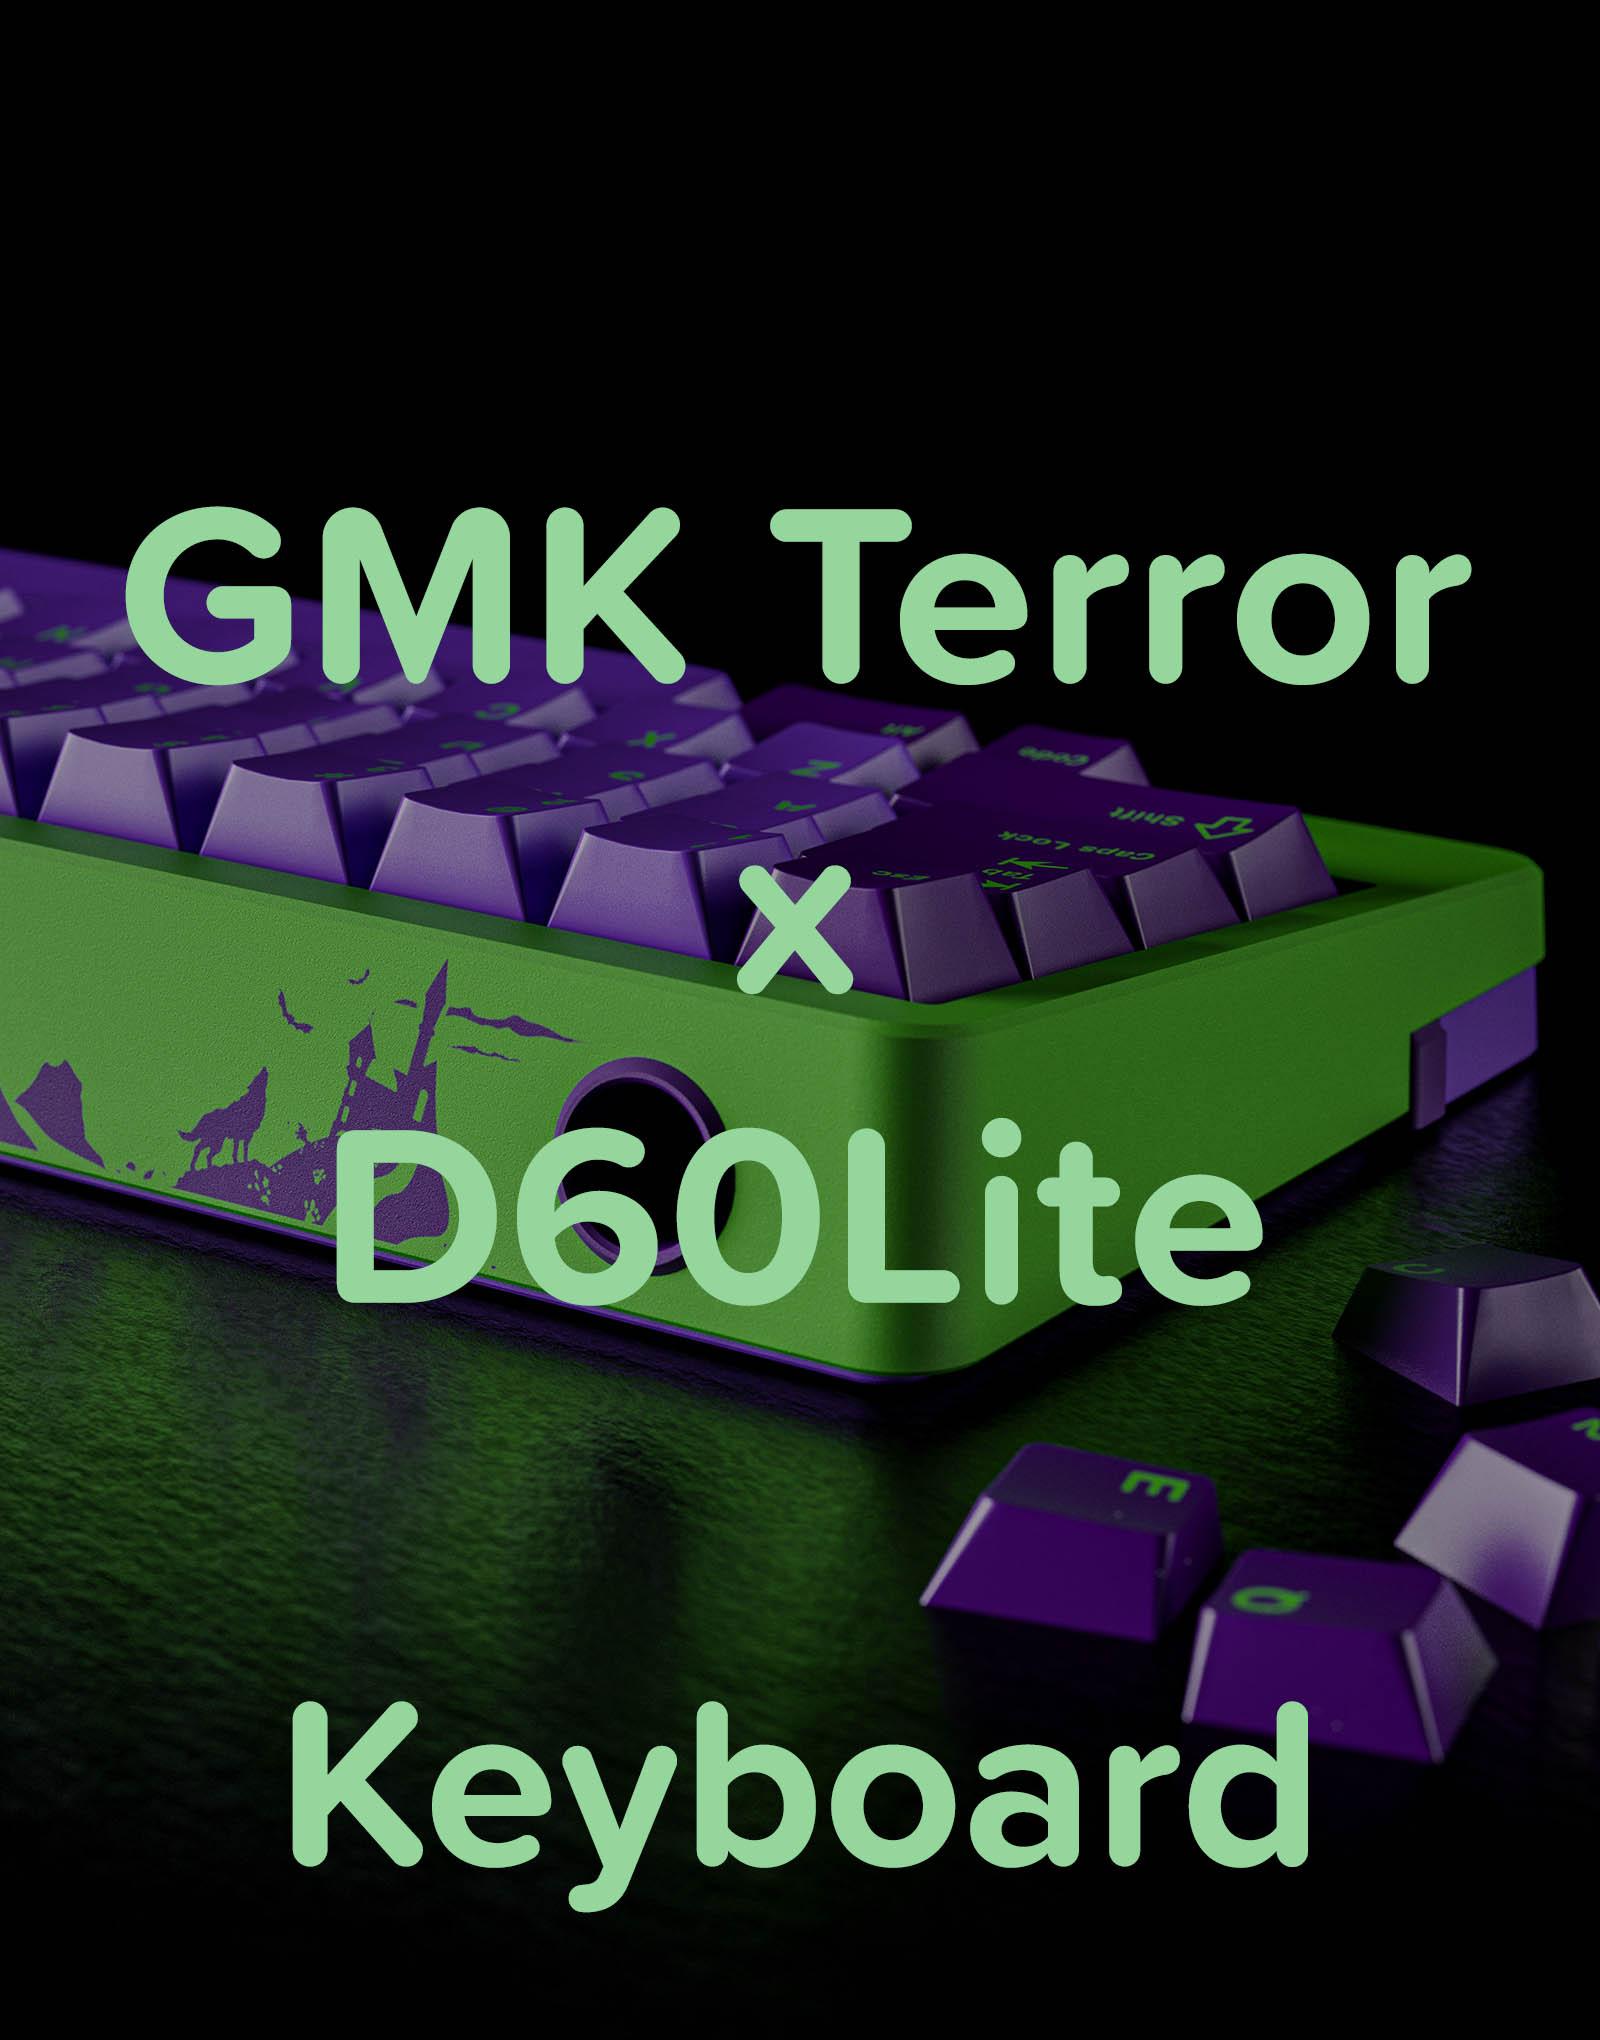 GMK Terror x D60Lite Keyboard - Product Image